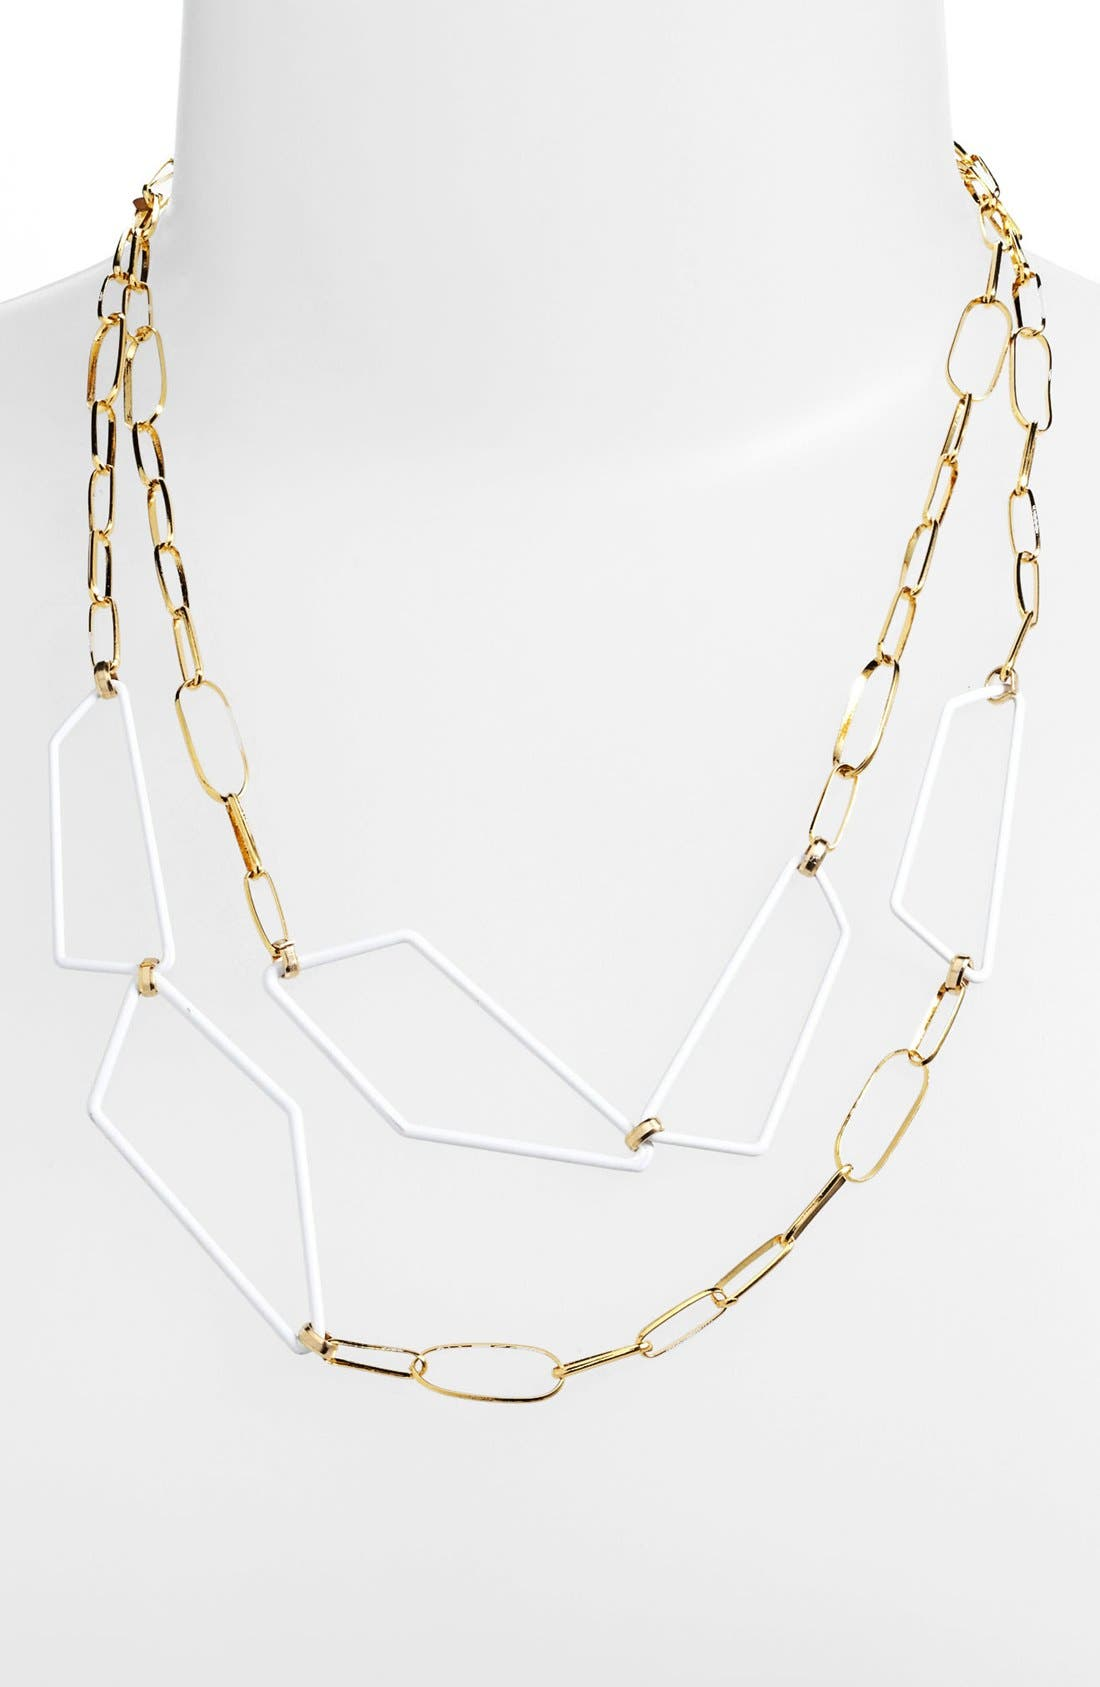 Alternate Image 1 Selected - Alexis Bittar 'Miss Havisham - Liquid Gold' Multistrand Link Necklace